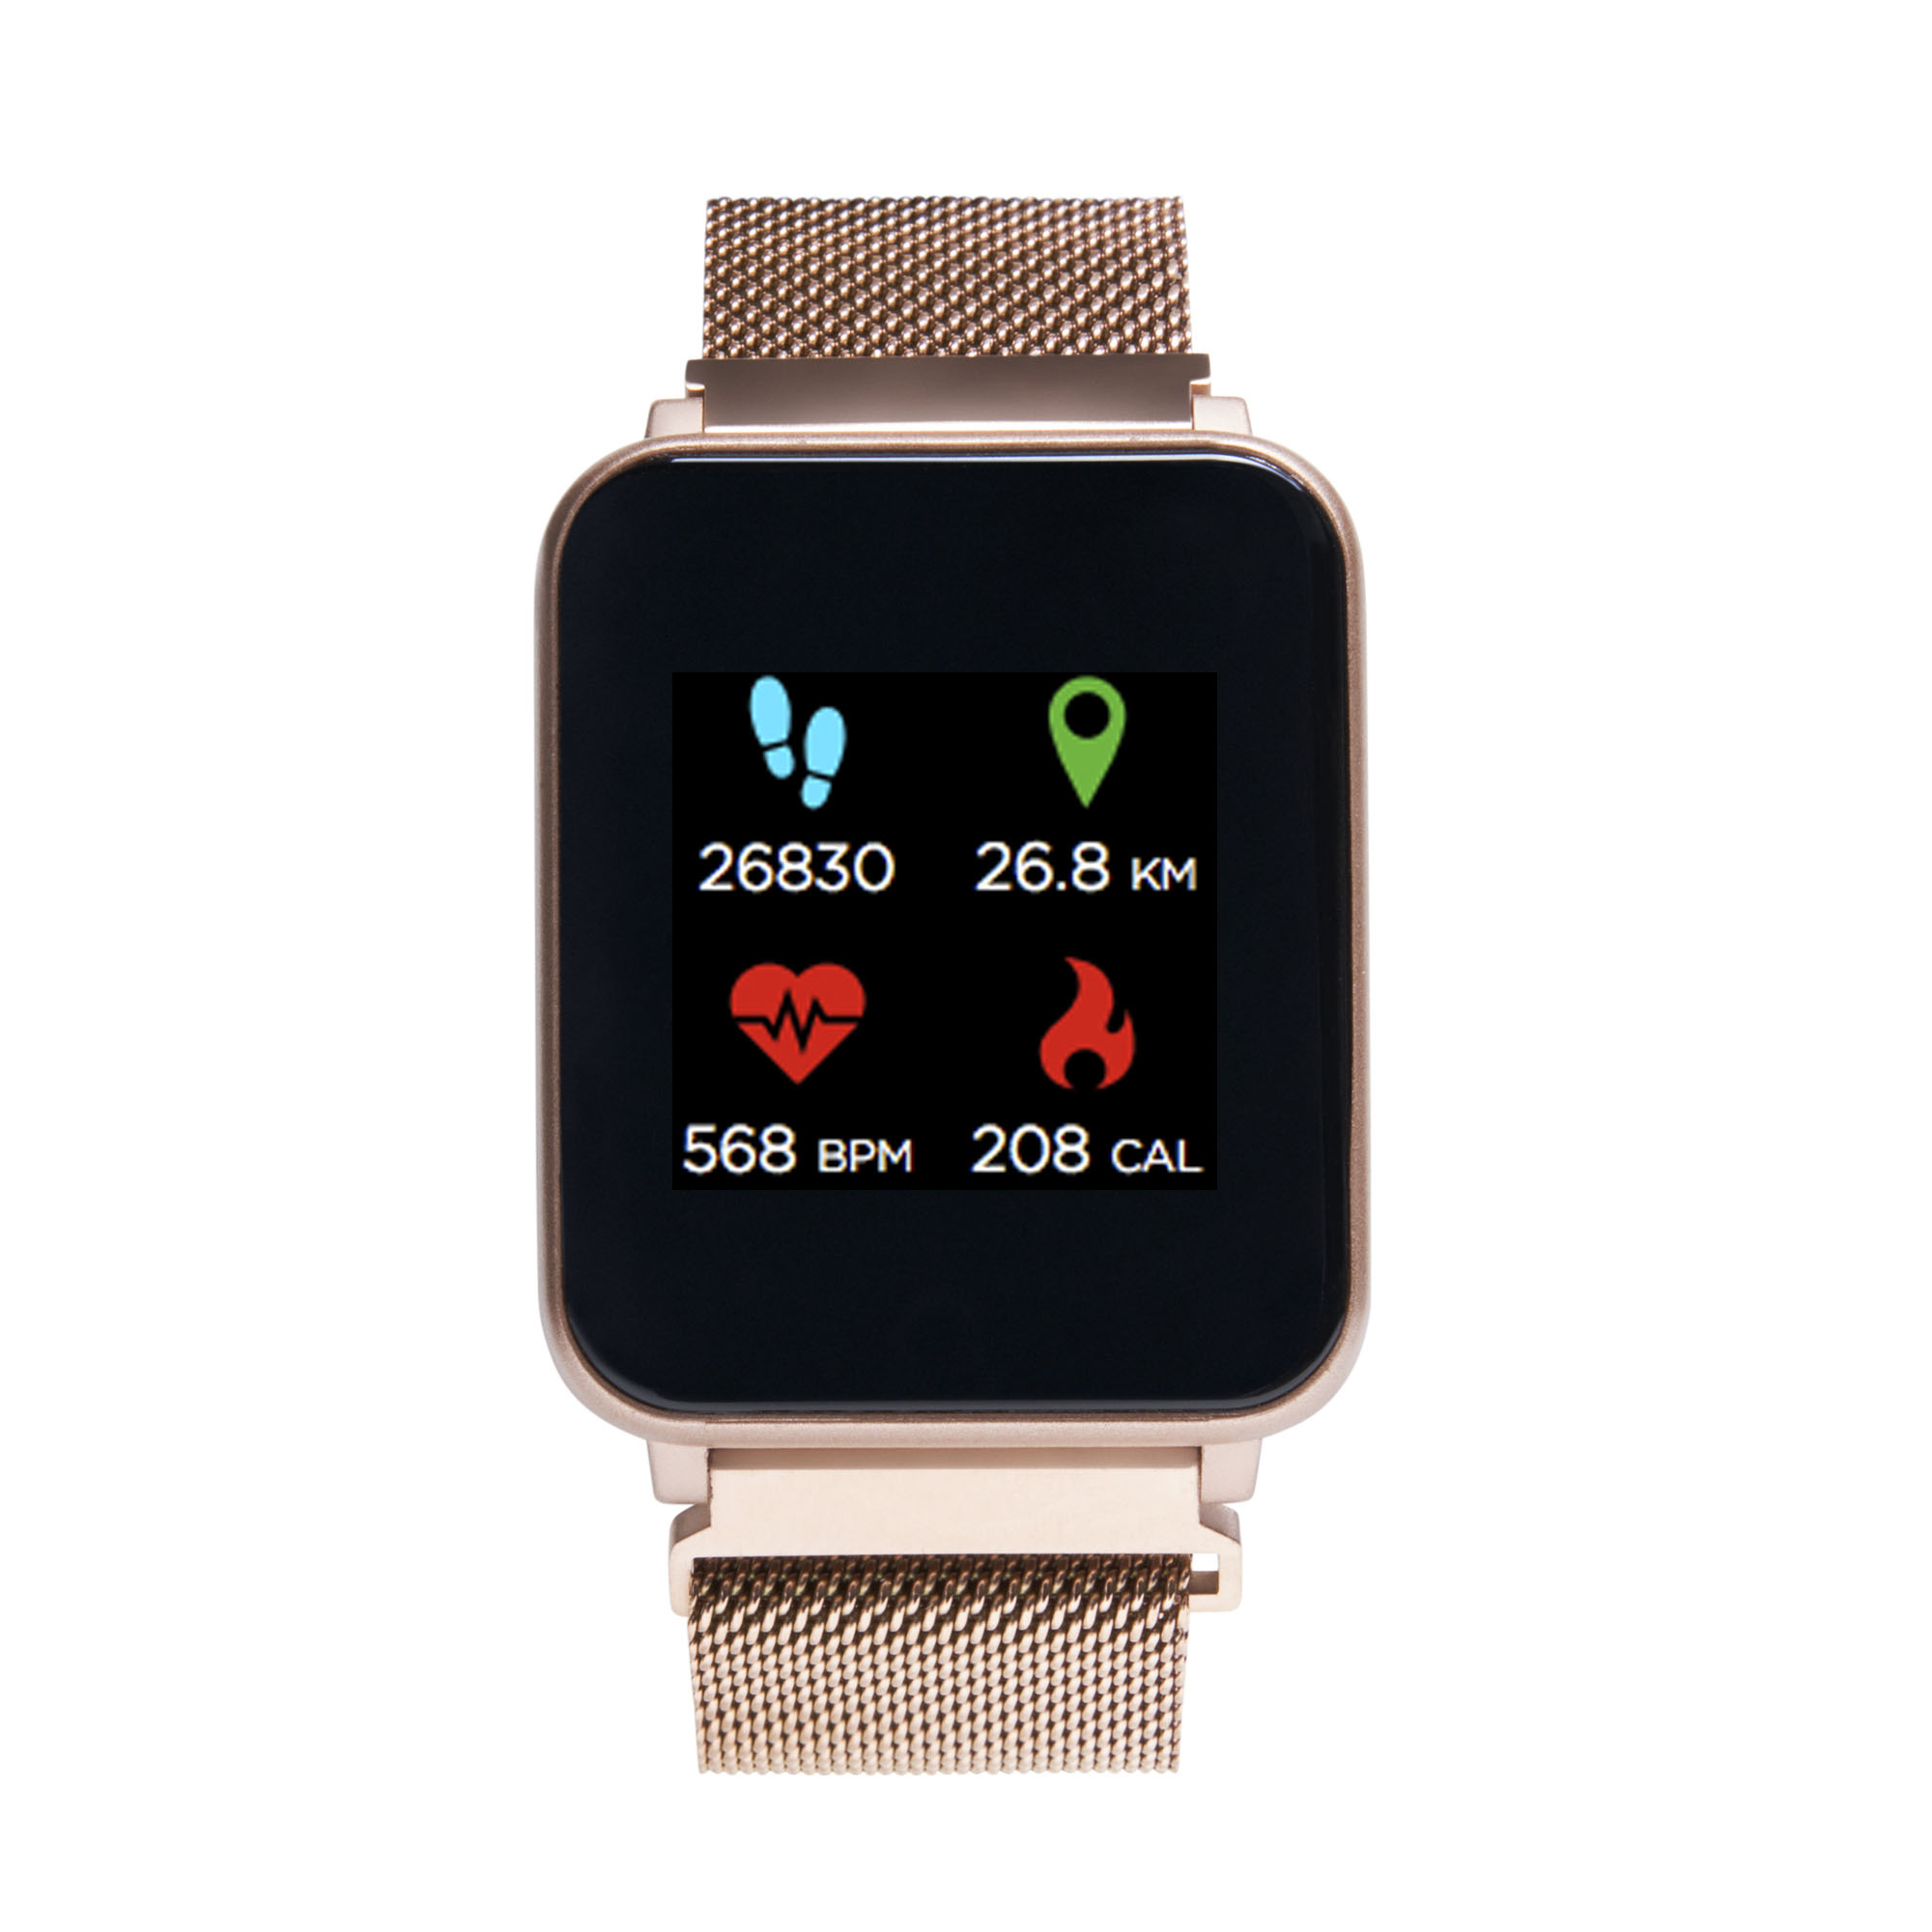 contravveleno vassoio Groviglio  iTech - iTech Fusion Mesh Strap Smartwatch, Rose Gold - Walmart.com